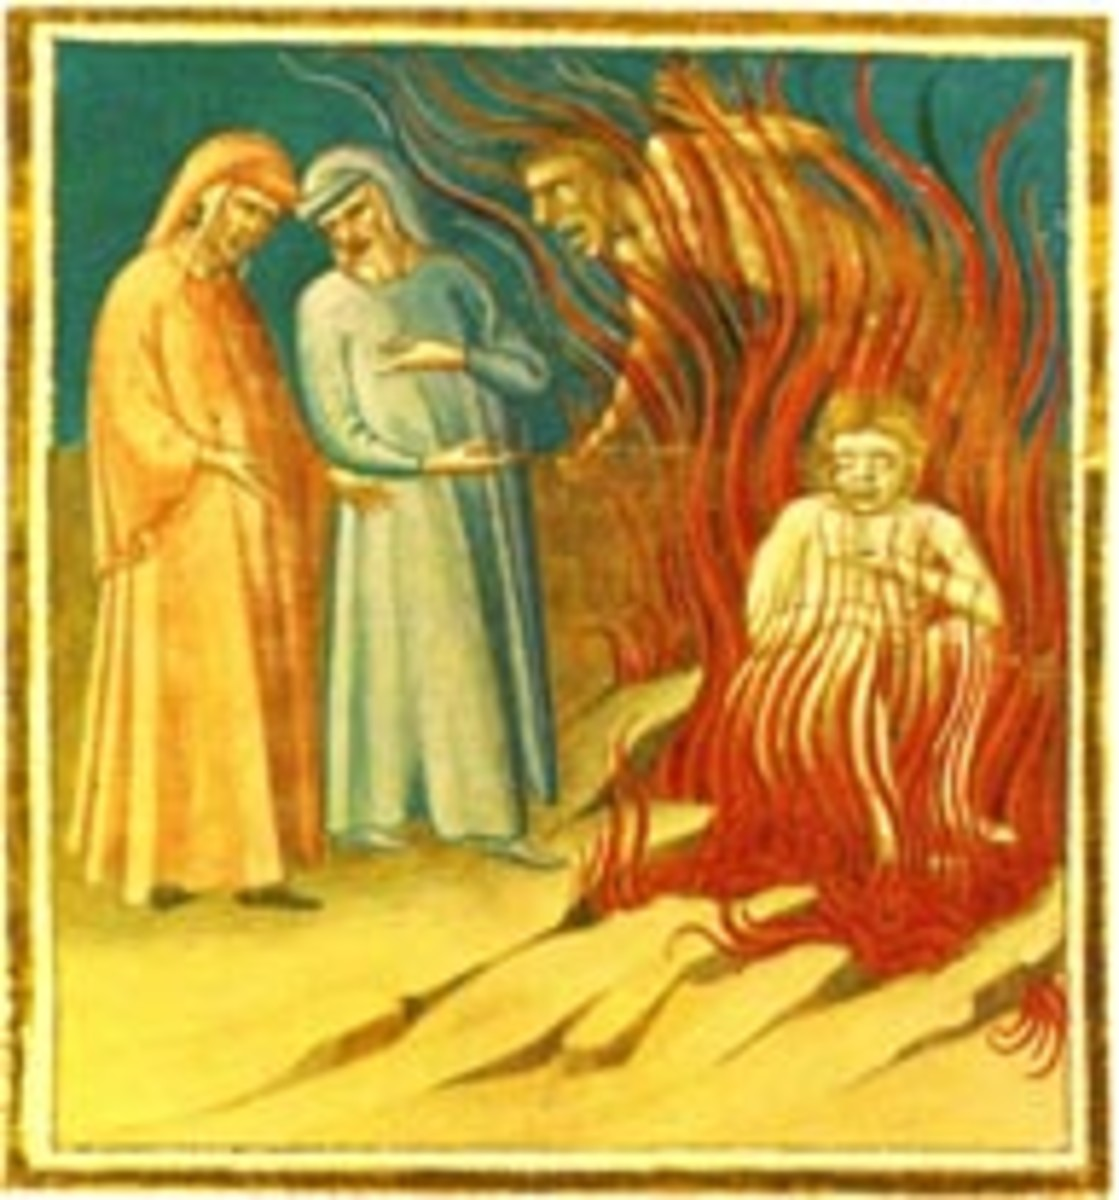 Dante's Inferno Canto XXVII